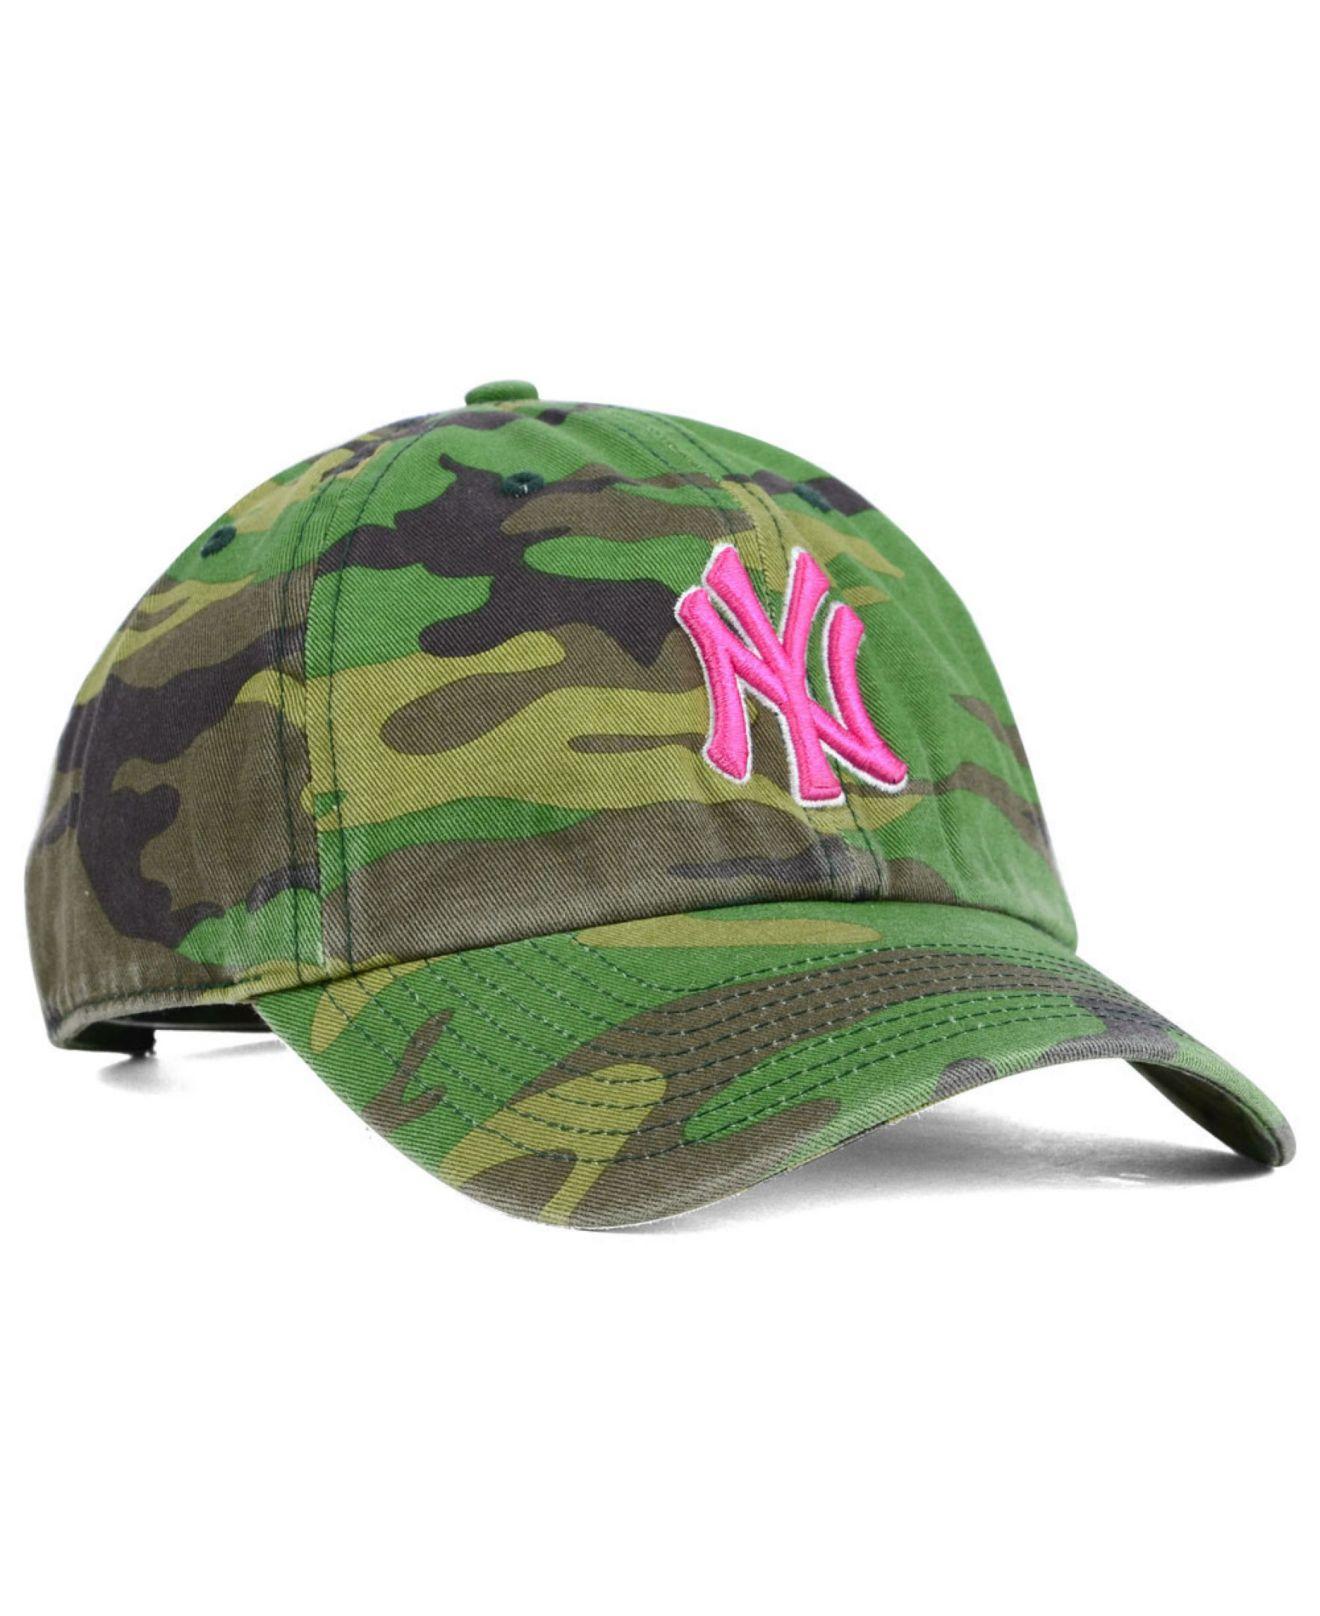 ab76aafe0c6 Lyst - 47 Brand Women s New York Yankees Clean Up Cap in Green